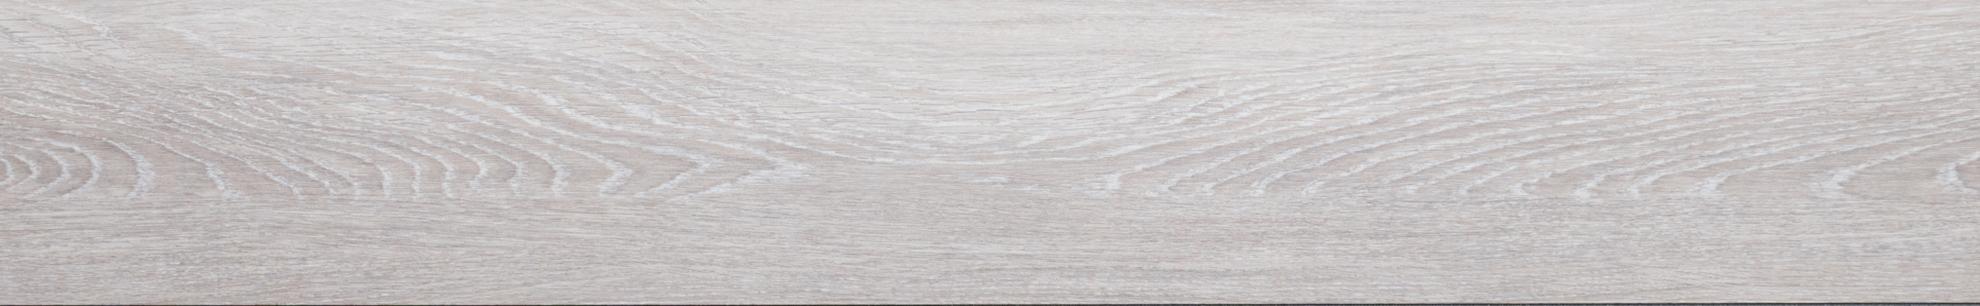 Виниловая плитка NOX EcoClick - EcoWood DryBack Дуб Тофино